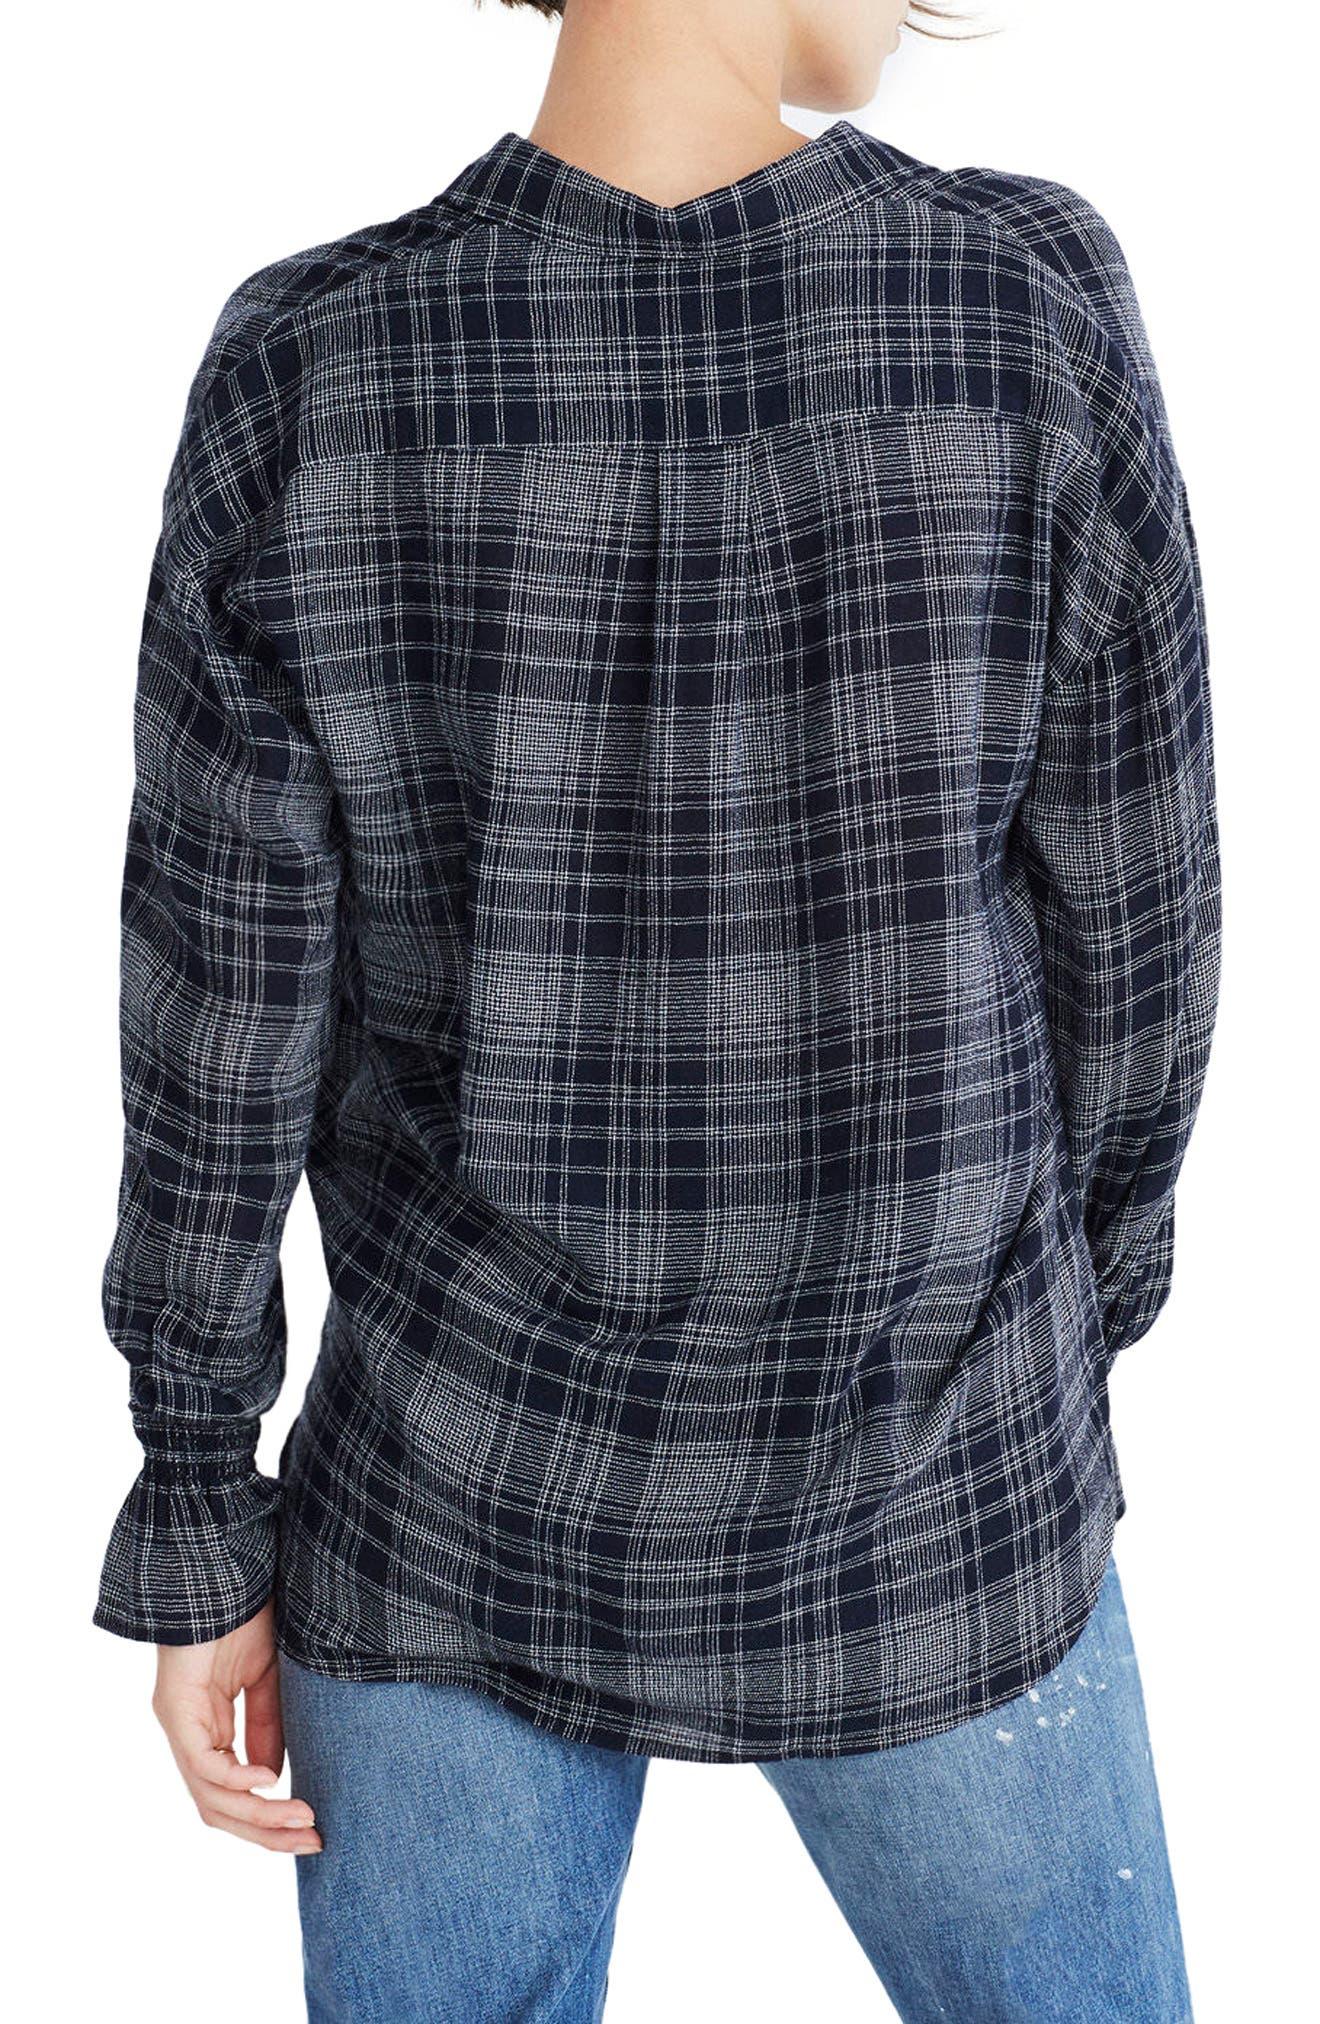 Westward Bell Sleeve Shirt,                             Alternate thumbnail 2, color,                             400